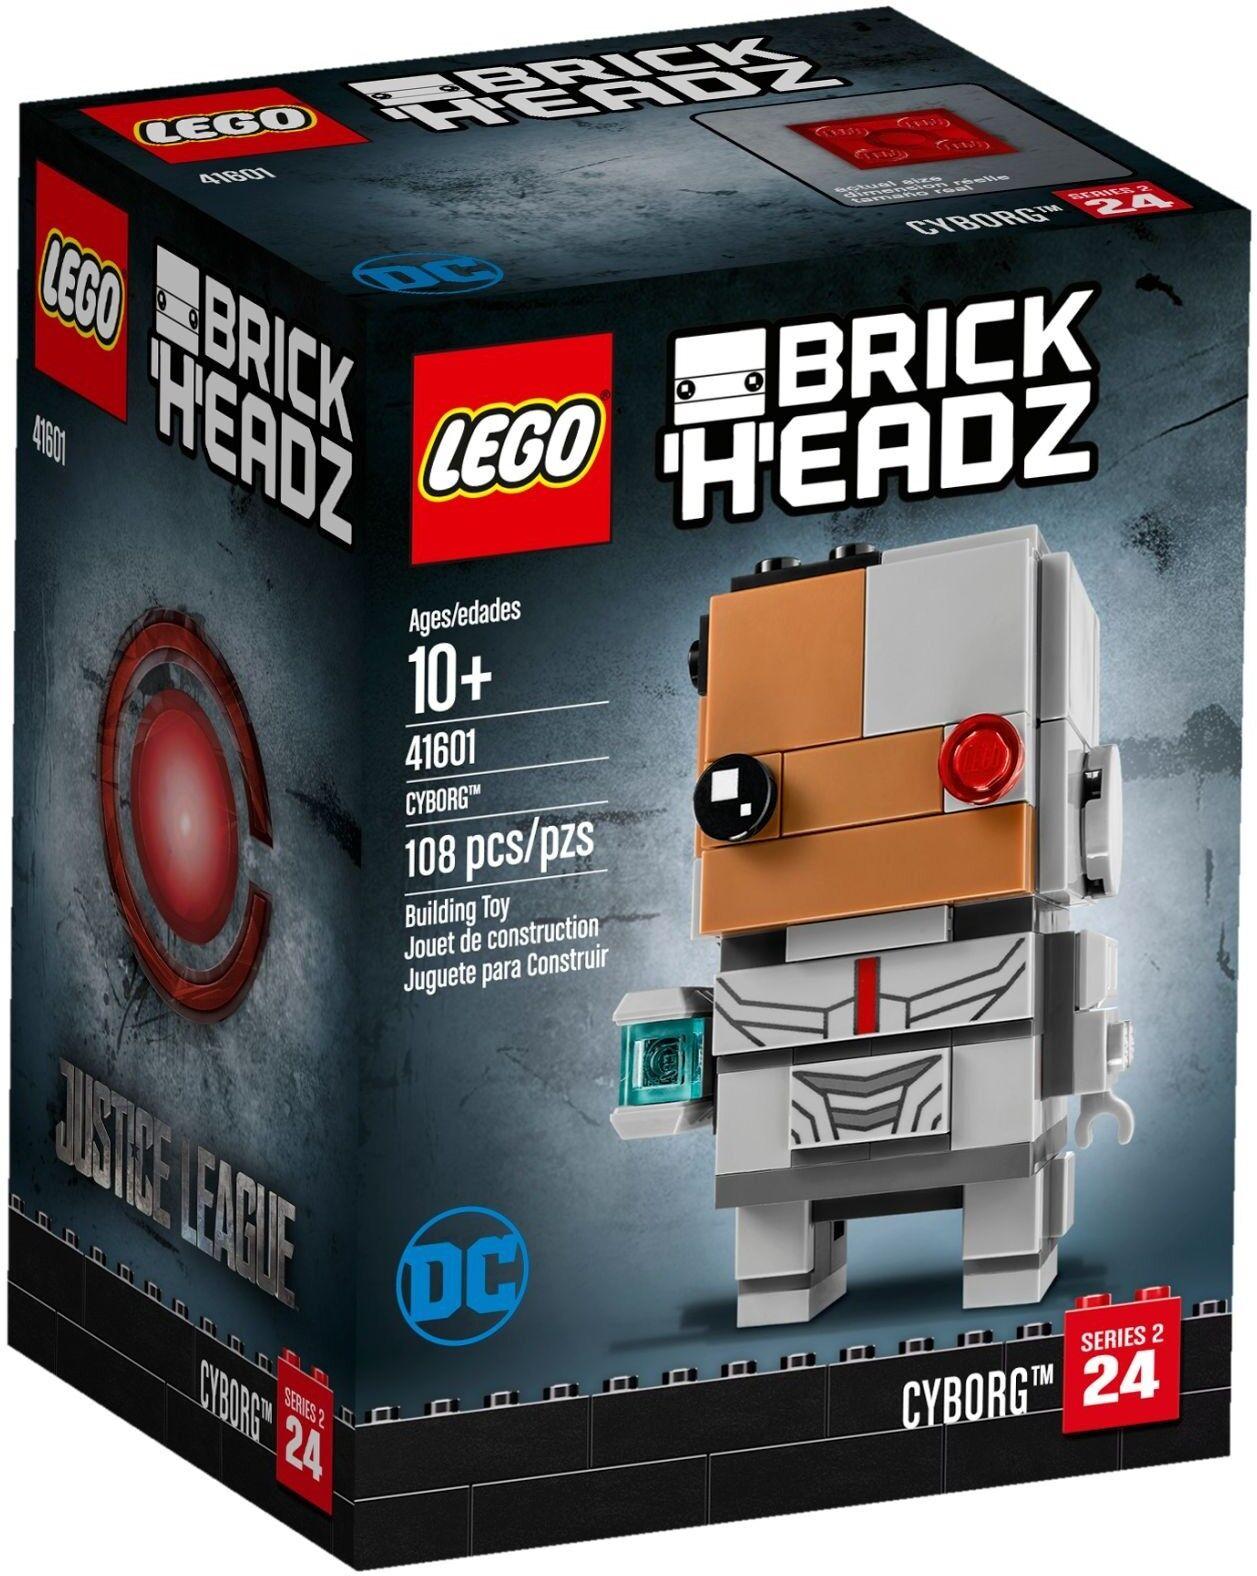 LEGO® BrickHeadz 41601 Cyborg™ NEU OVP_ NEW MISB NRFB